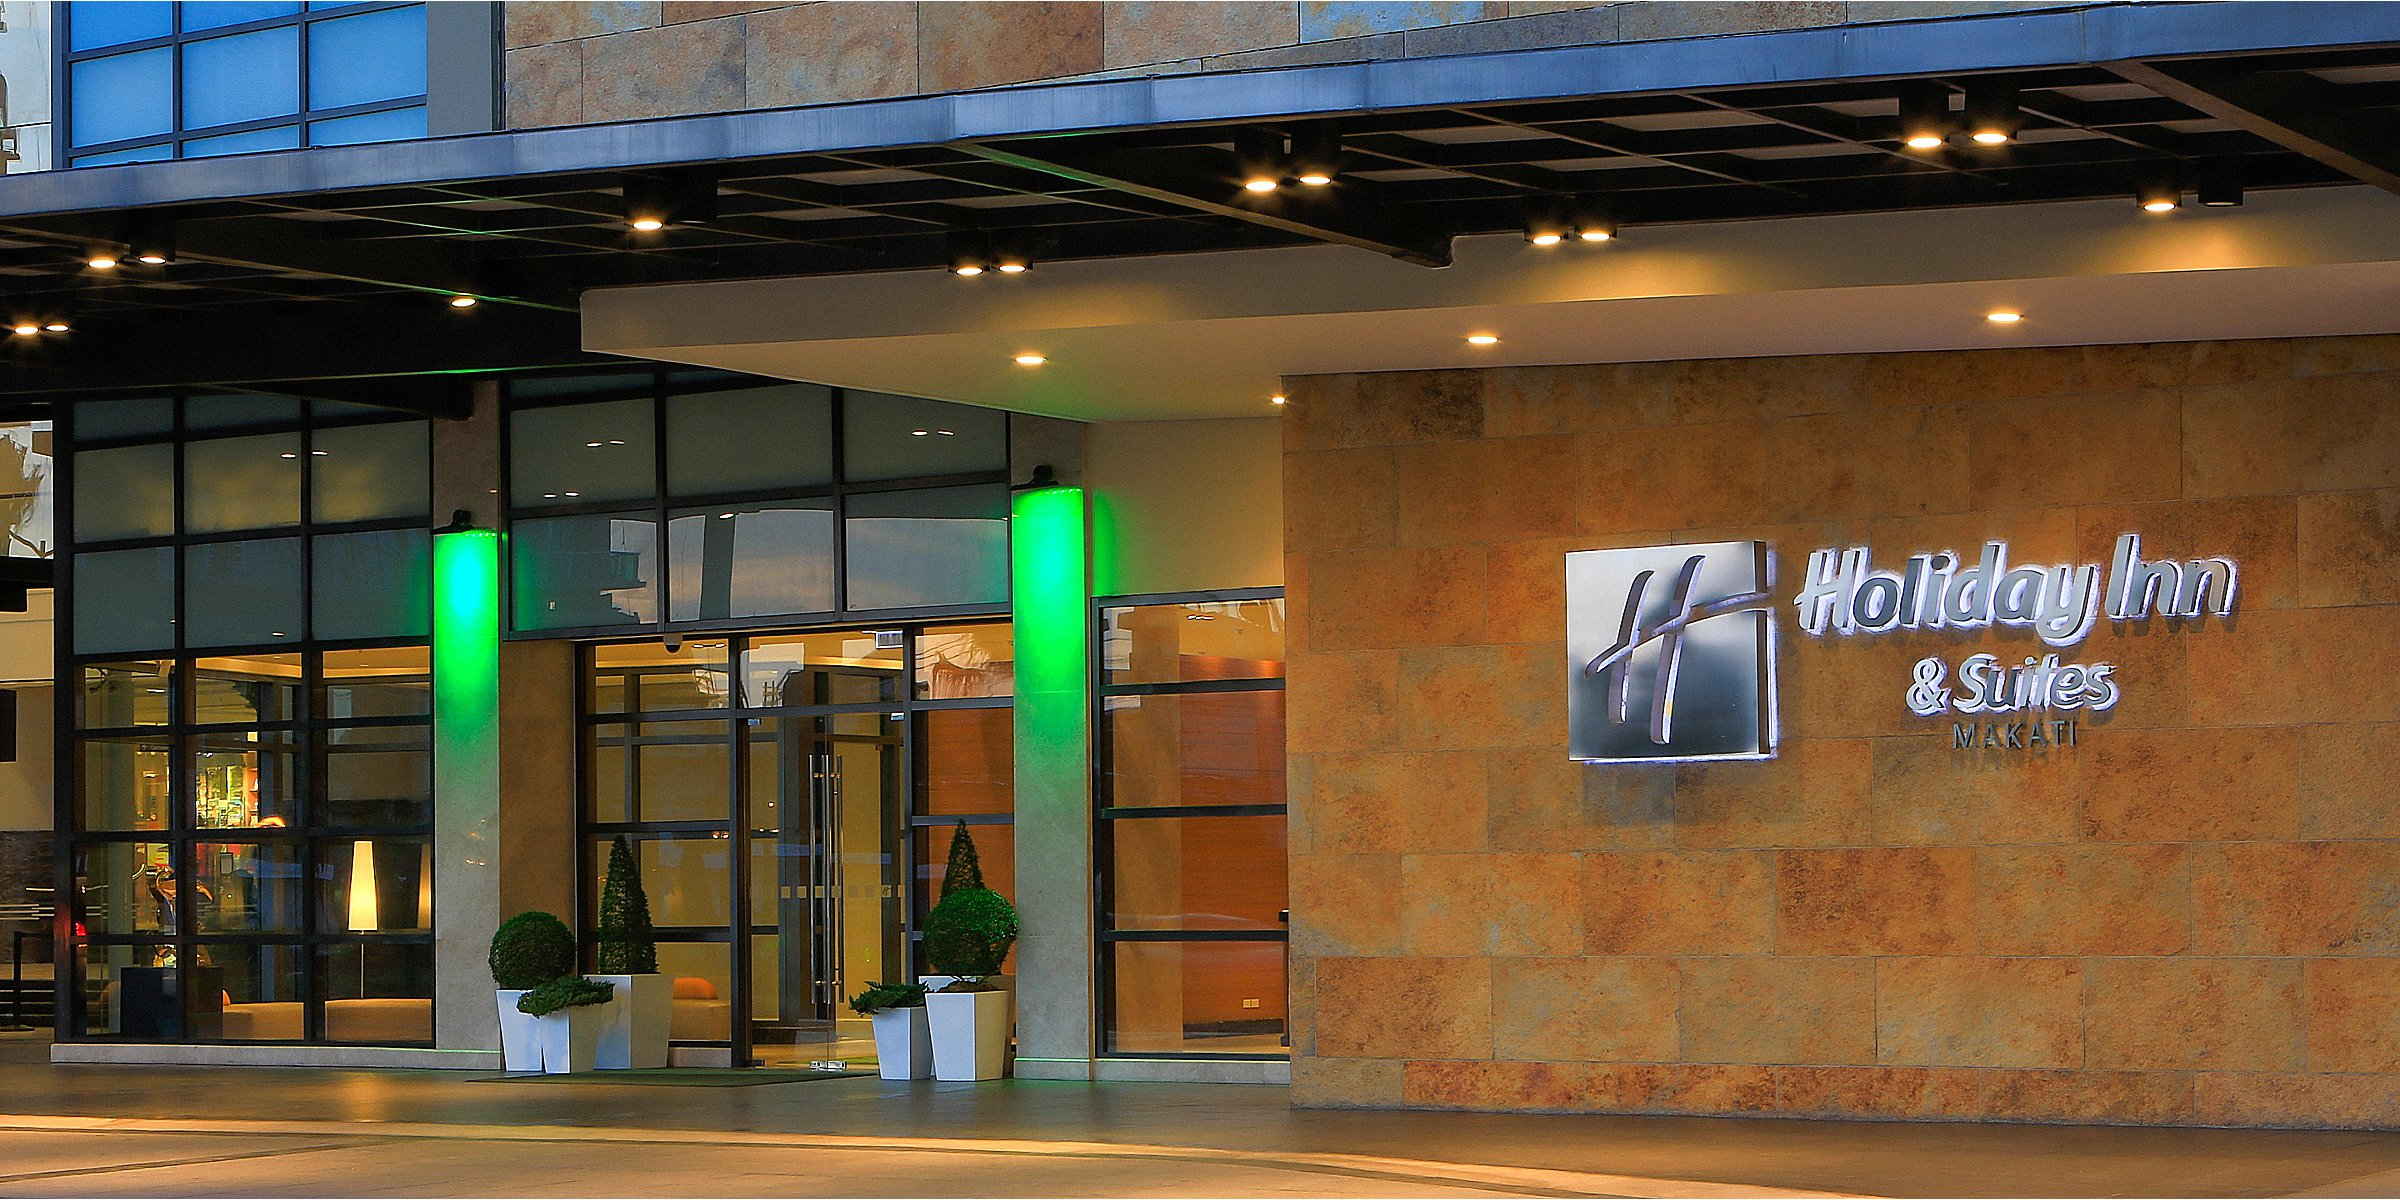 Holiday Inn Hotel Suites Makati Hotel By Ihg